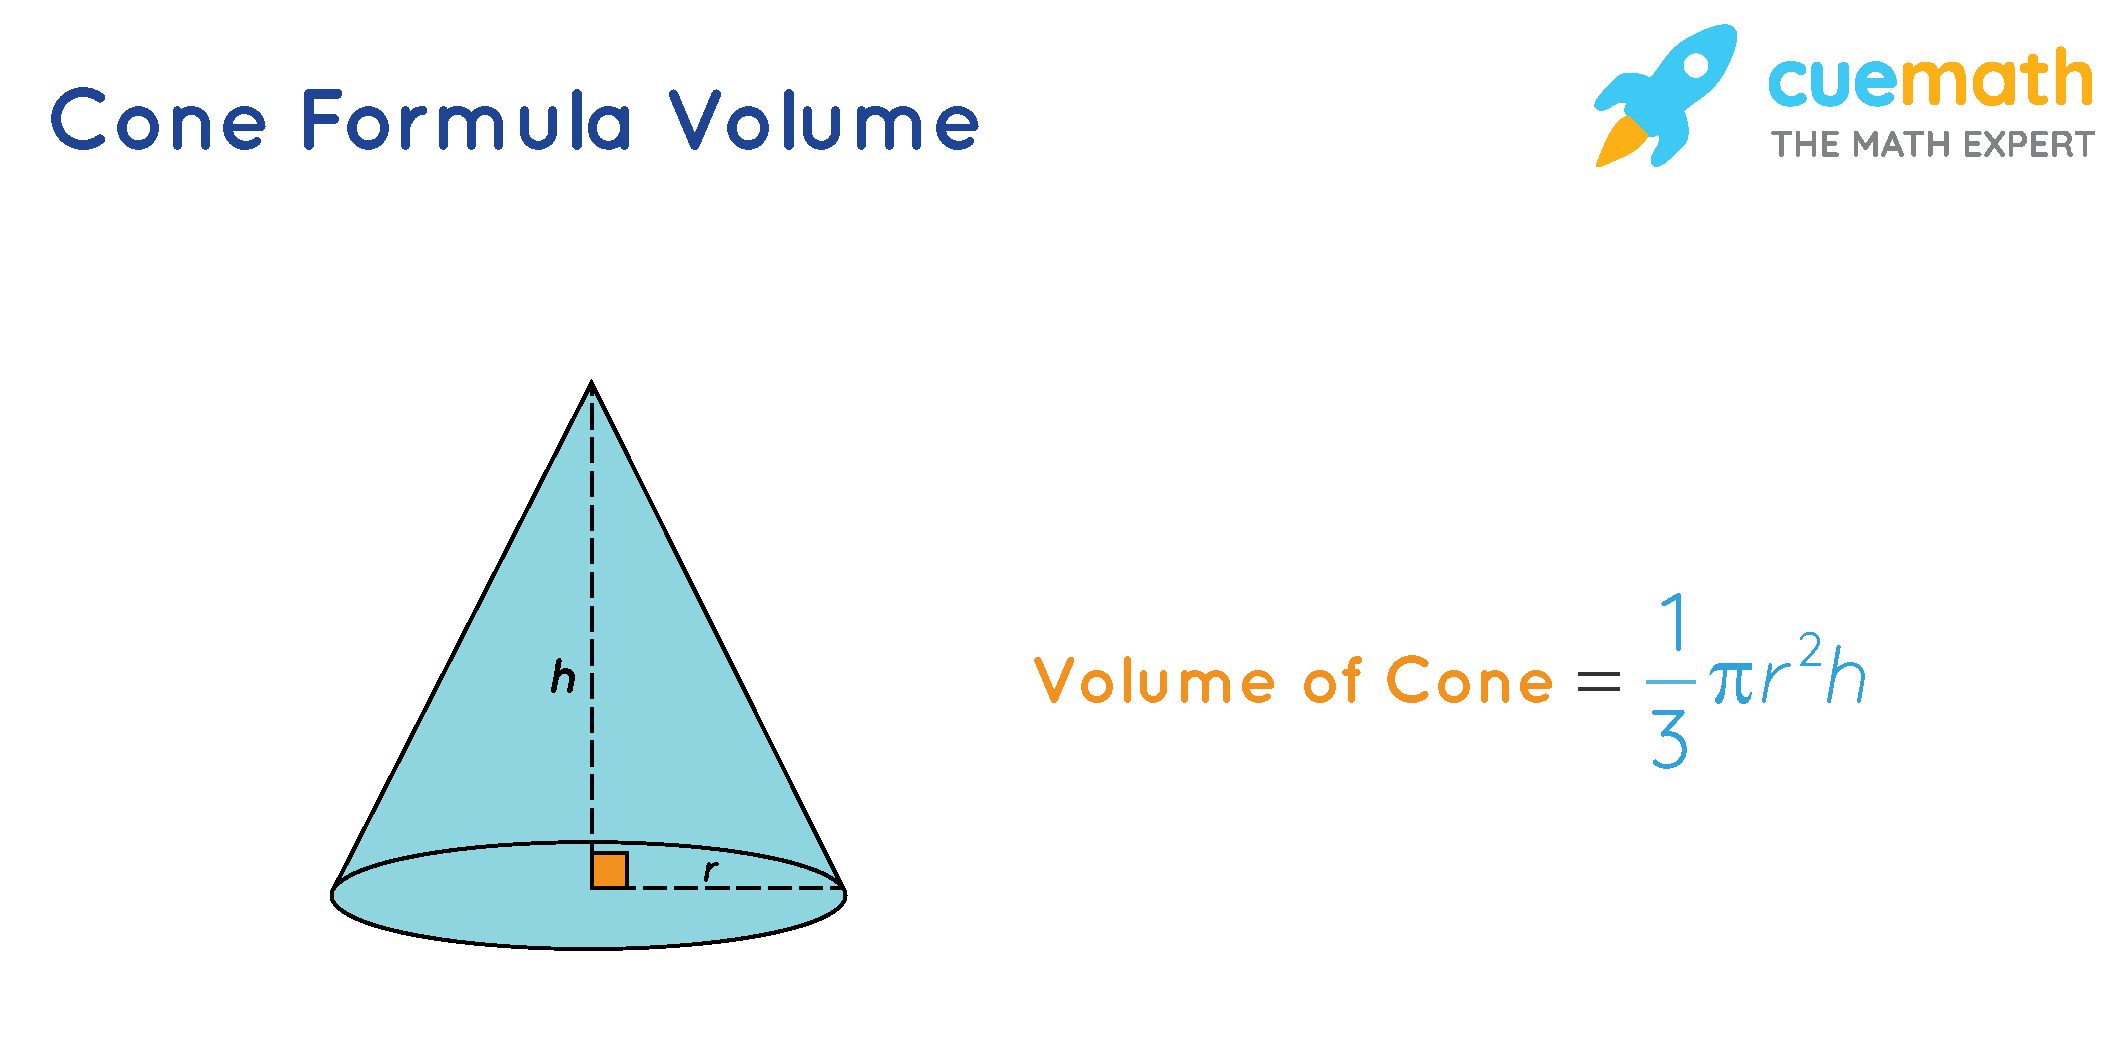 Cone Formula Volume